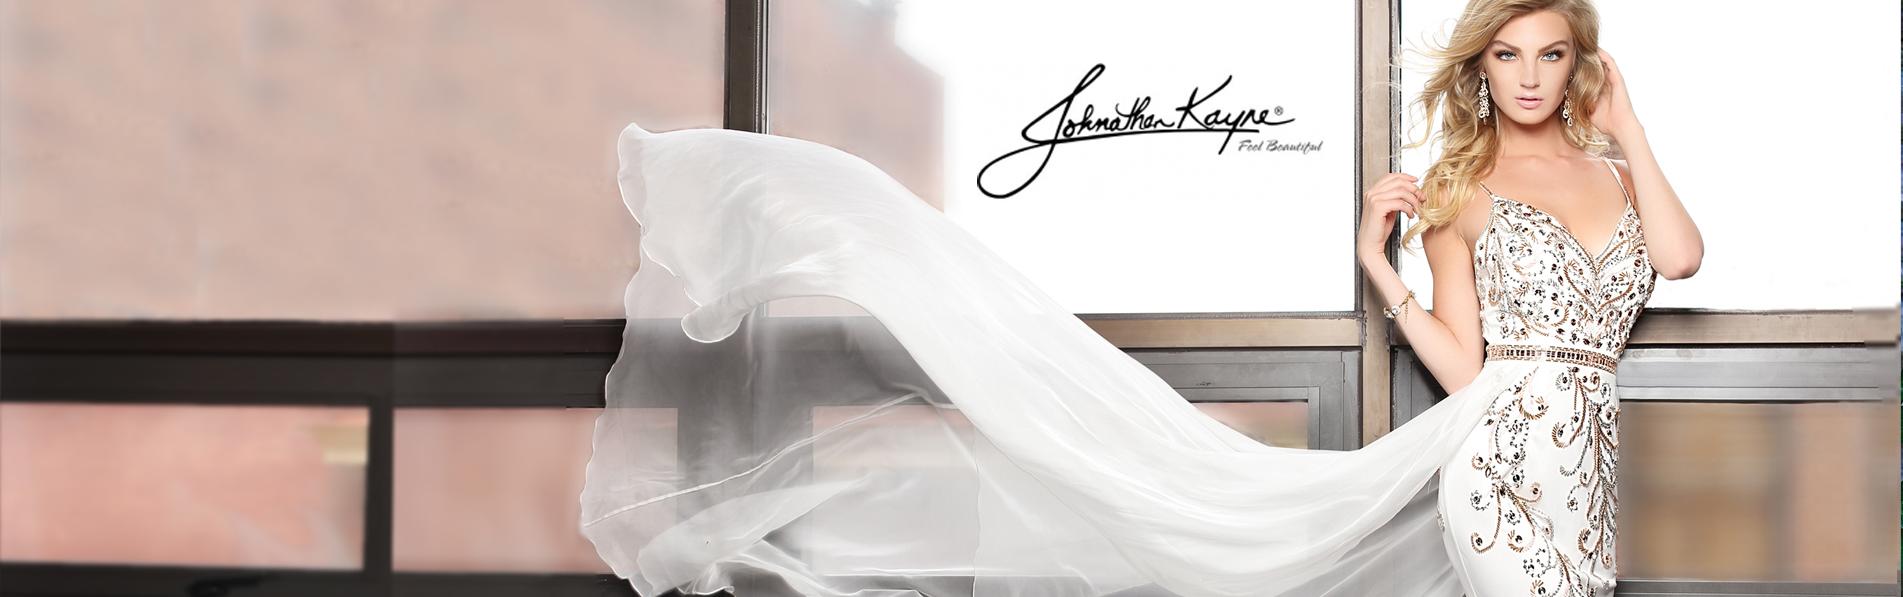 Johnathan Kayne